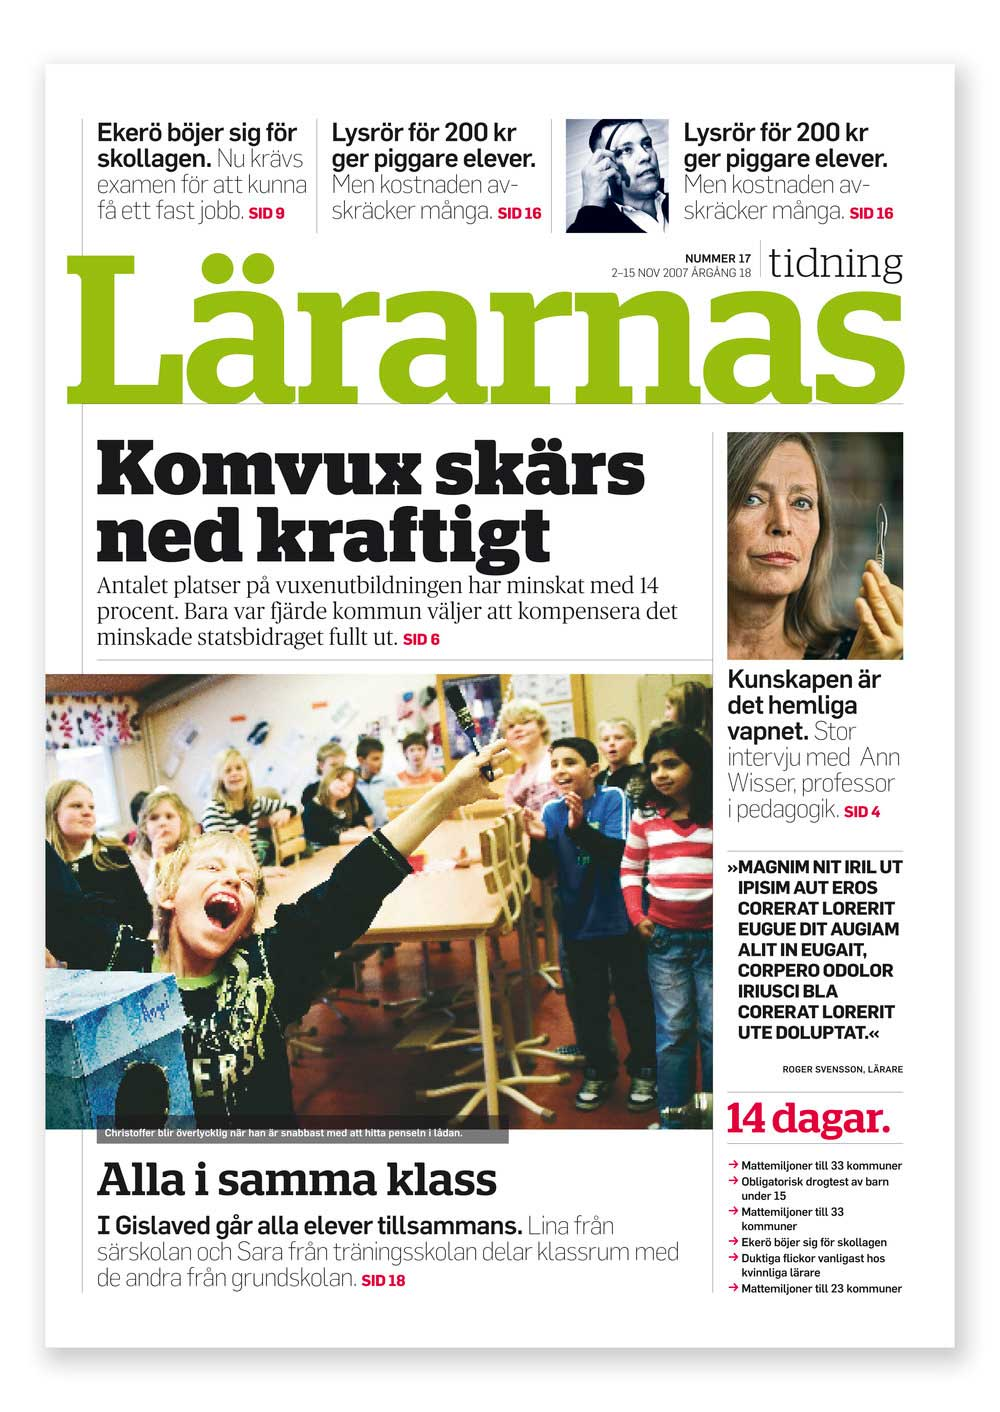 lararnas_tidning_1.jpg